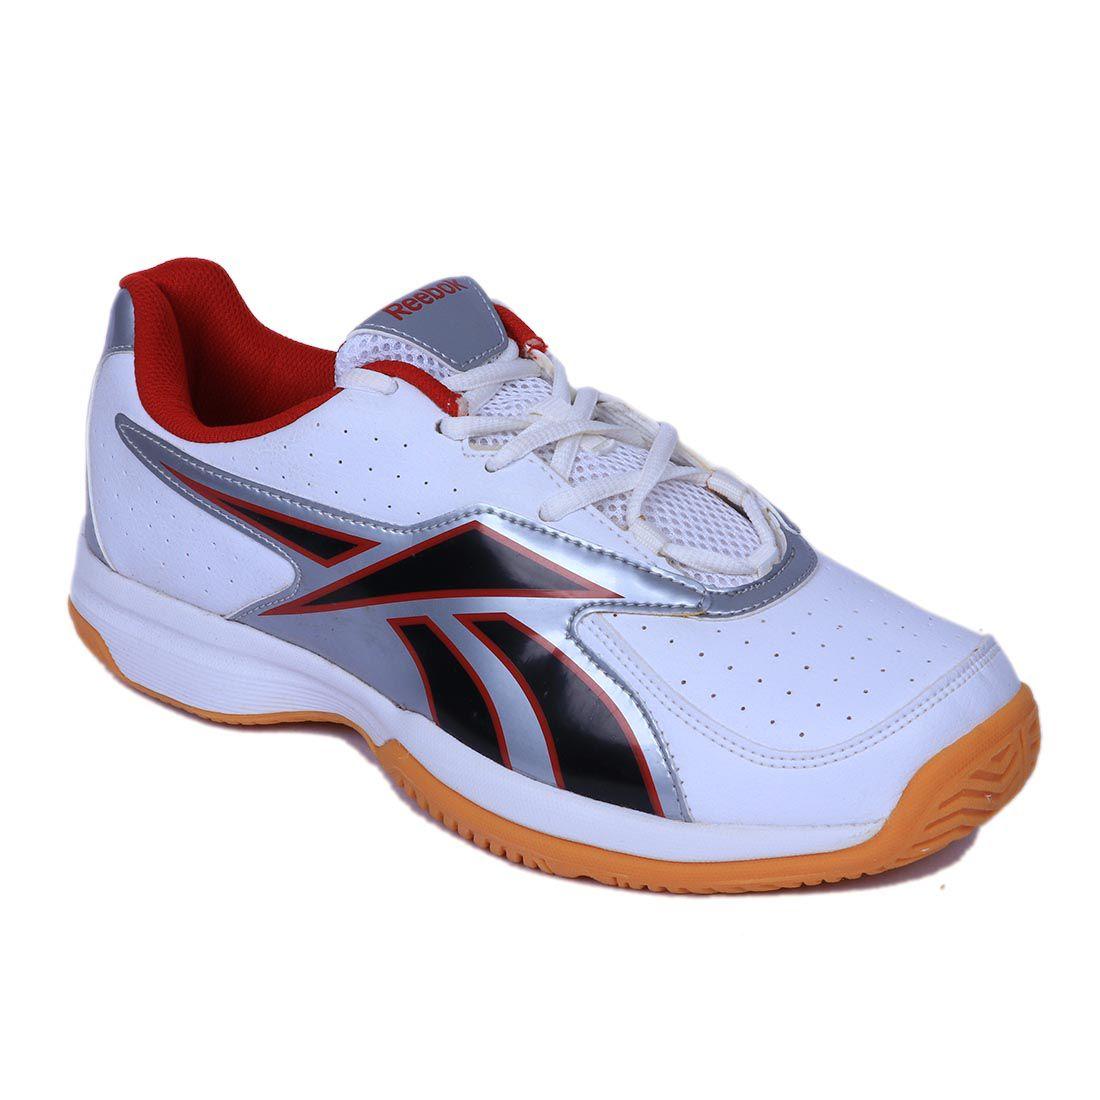 Reebok Match point indoor White Running Shoes - Buy Reebok ...